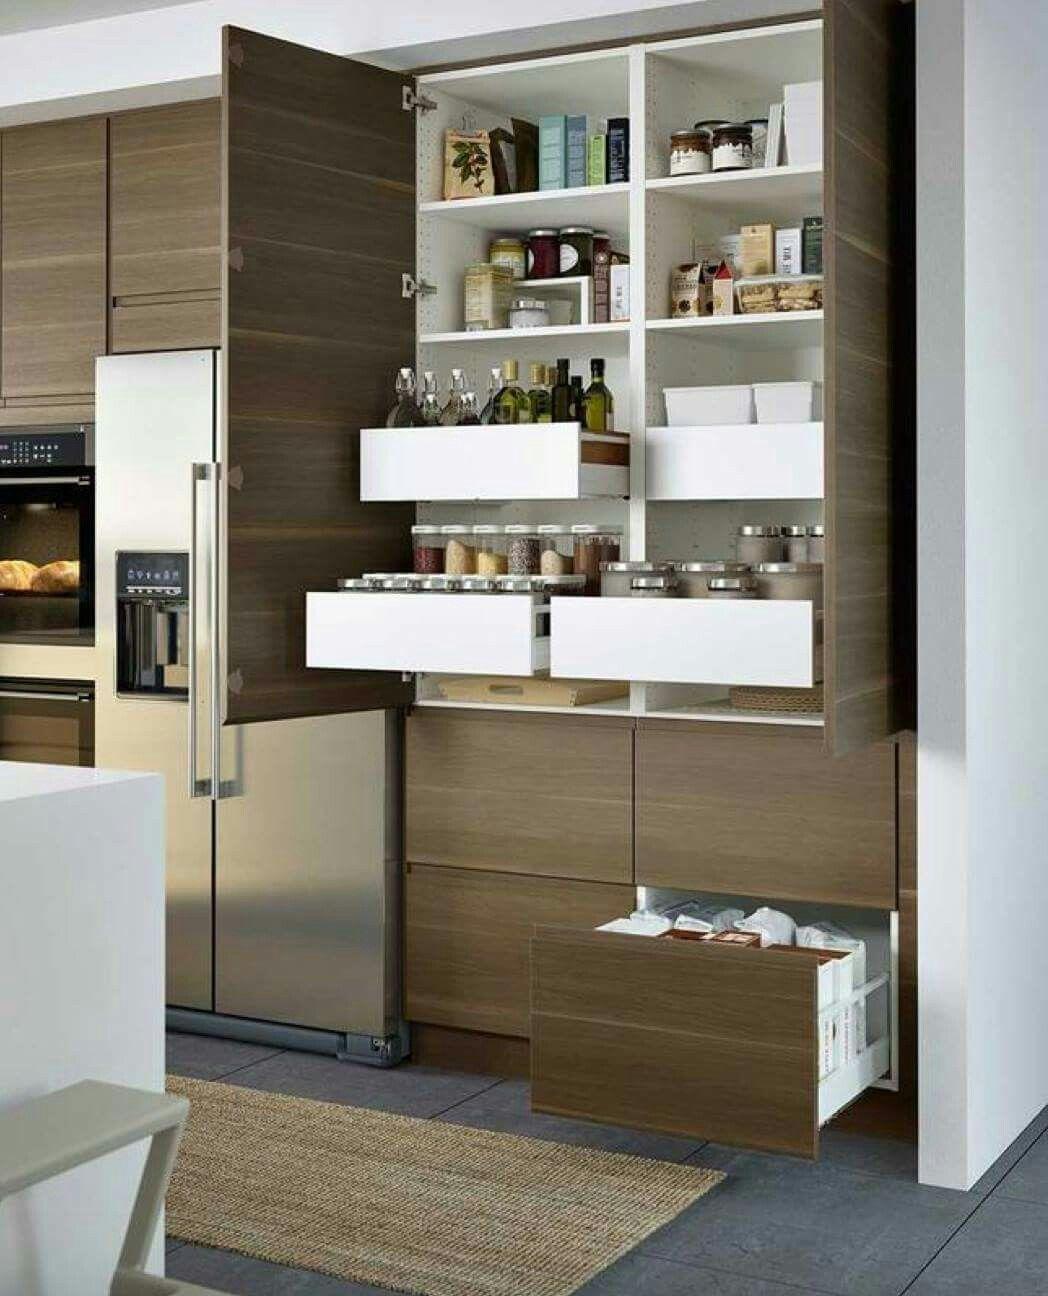 Mueble | Cocina | Pinterest | Küche